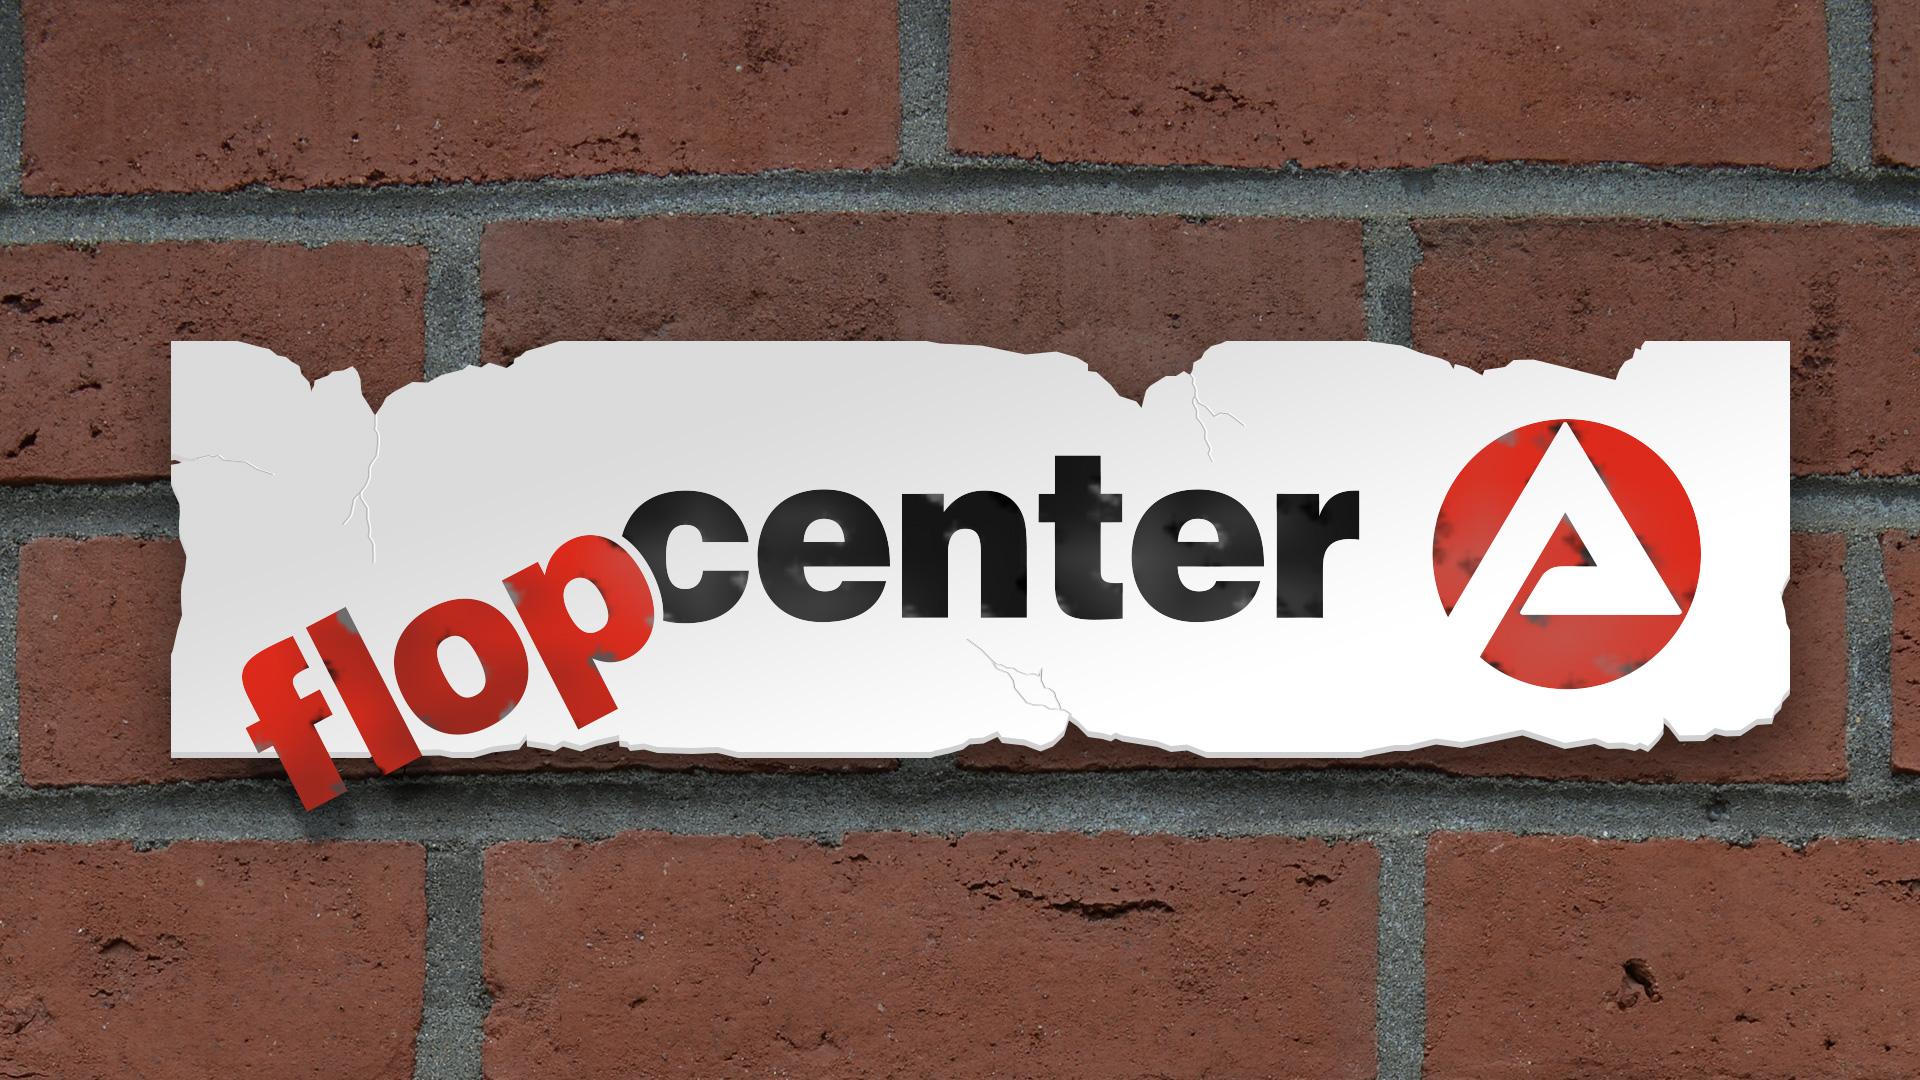 Flopcenter (2)